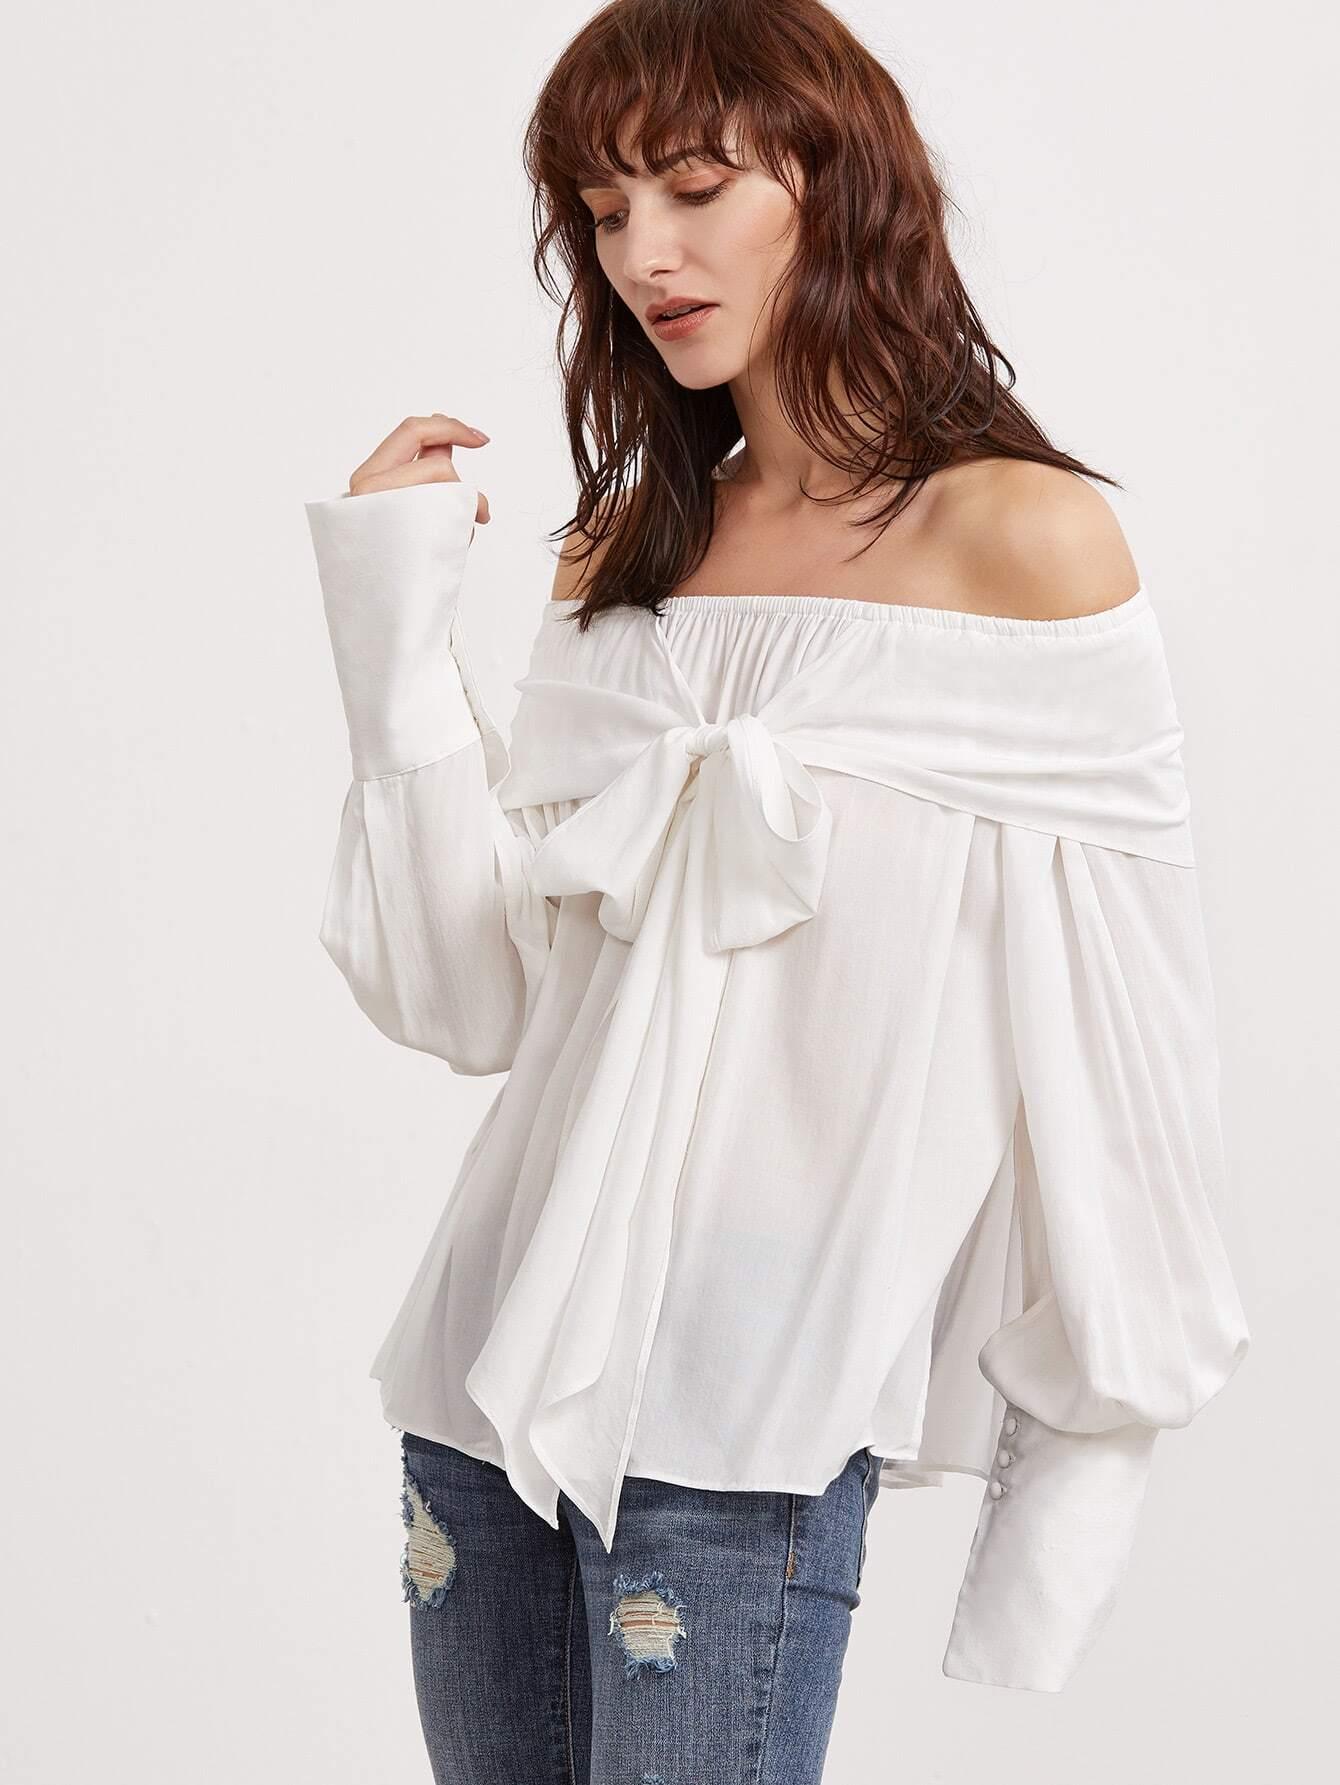 blouse161205710_2